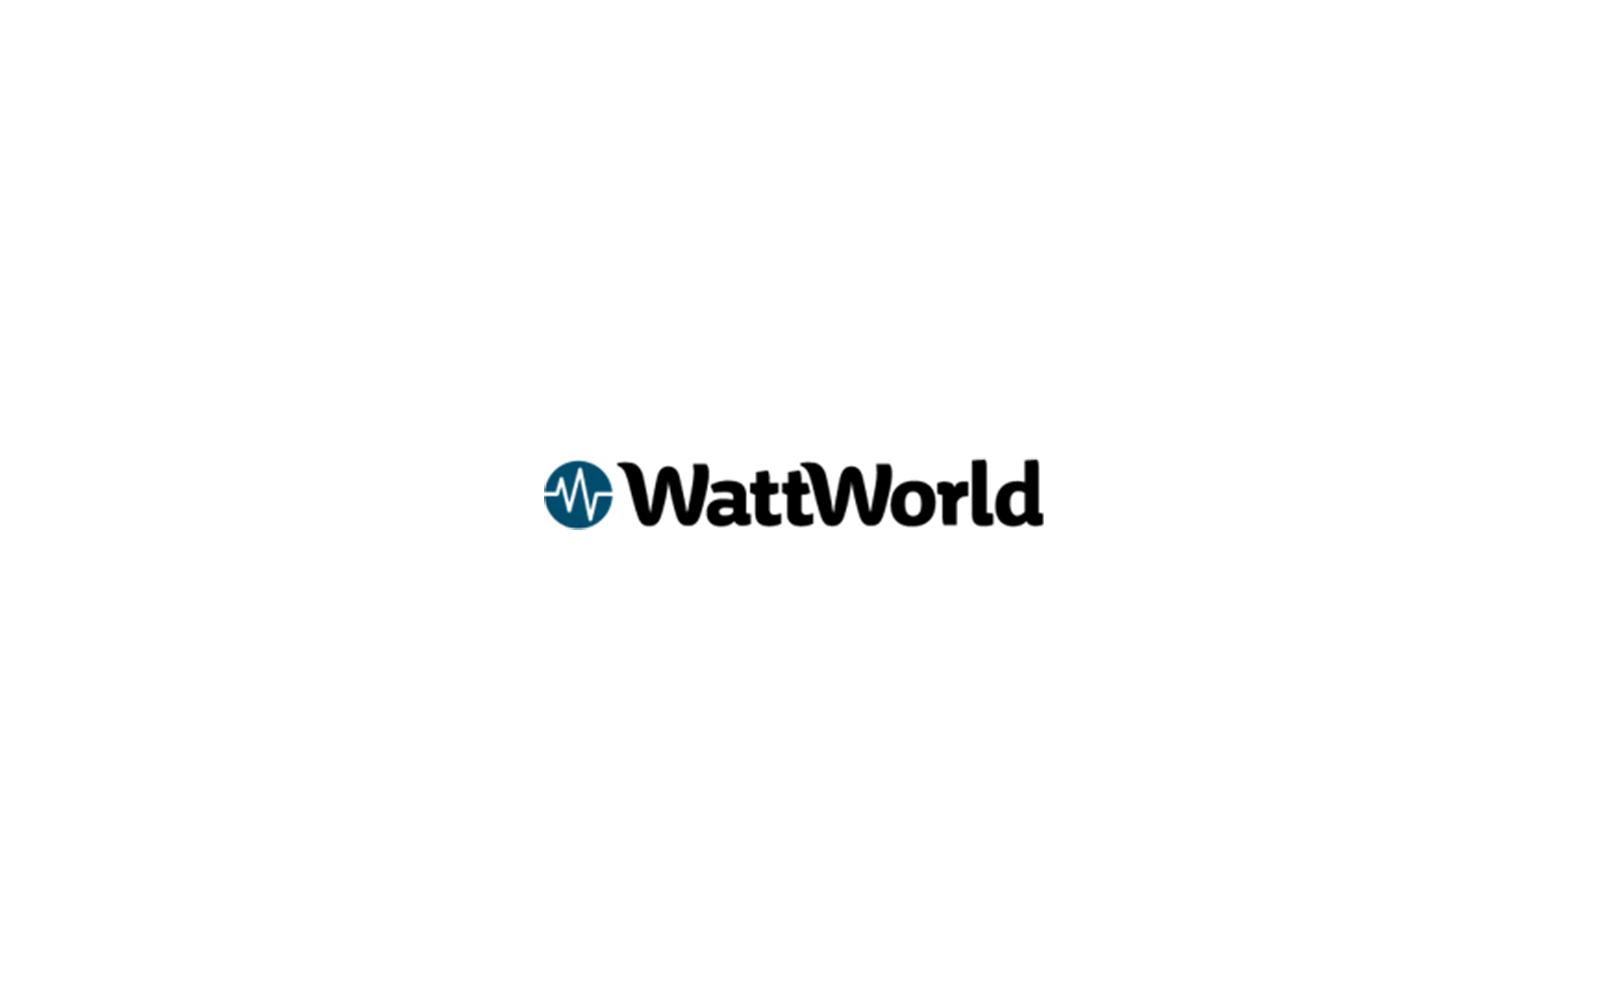 WATTWORLD GENEVA